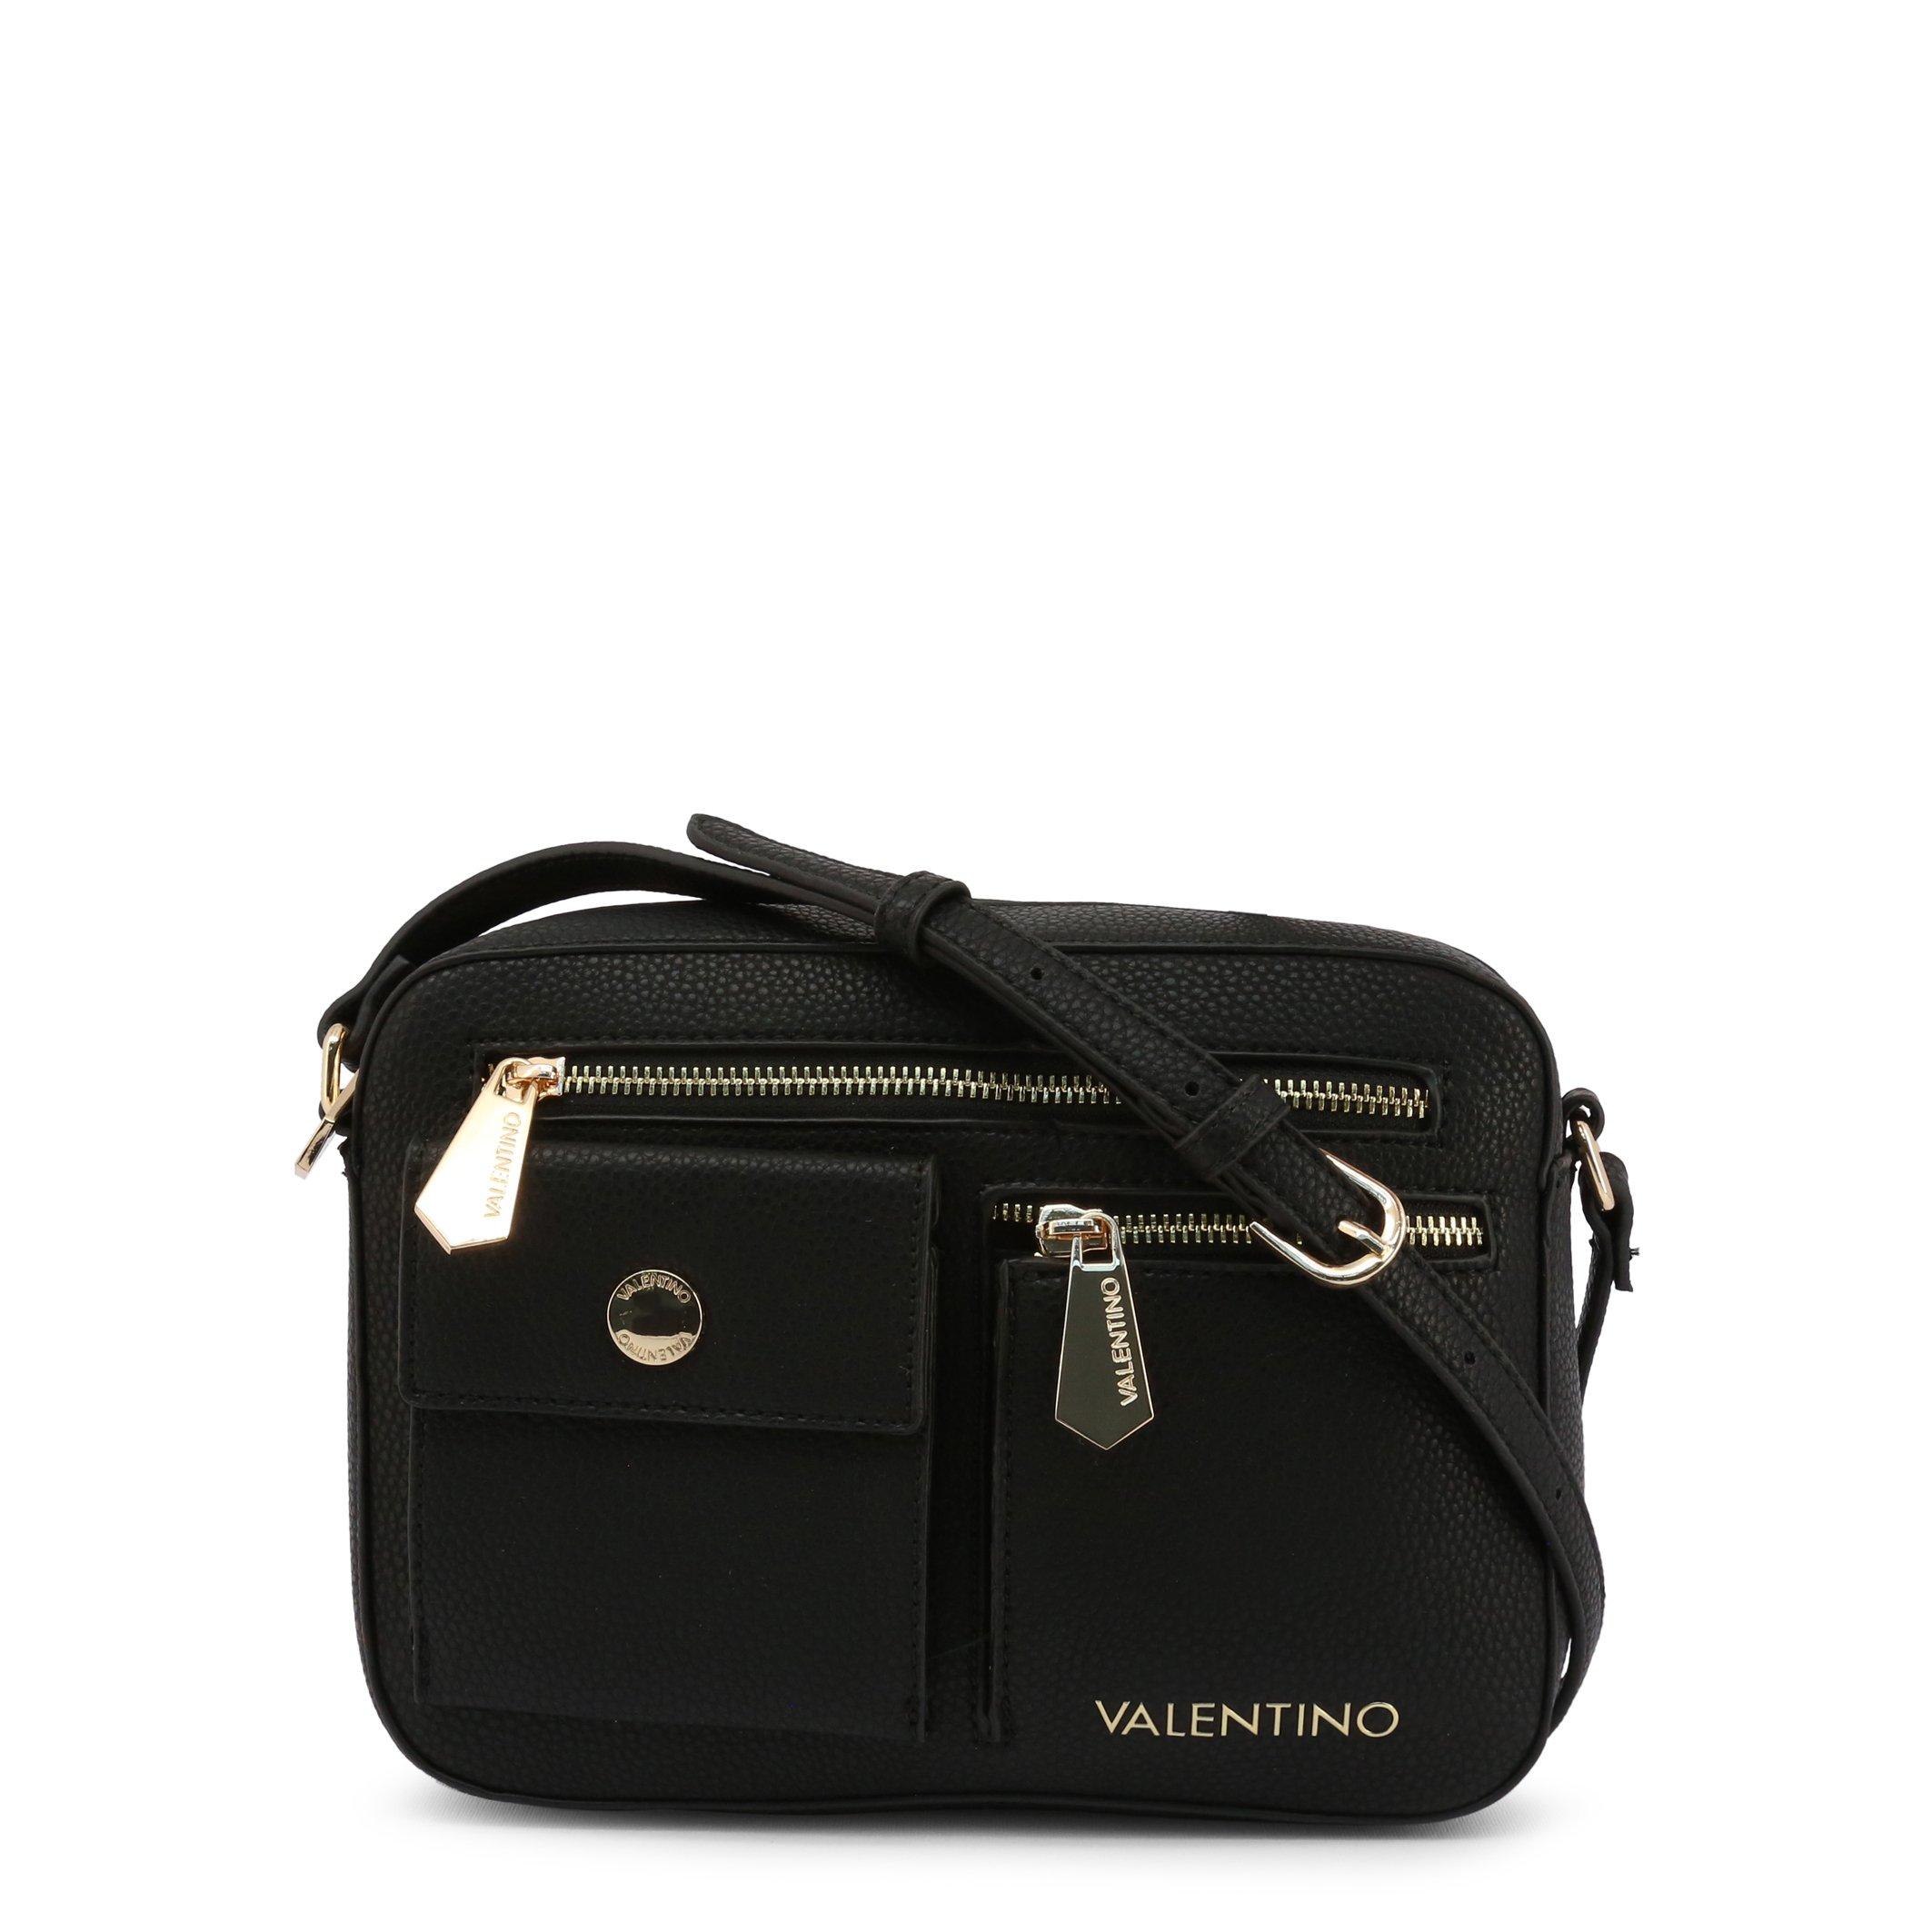 Valentino by Mario Valentino Women's Clutch Bag Various Colours CASPER-VBS3XL03 - black NOSIZE